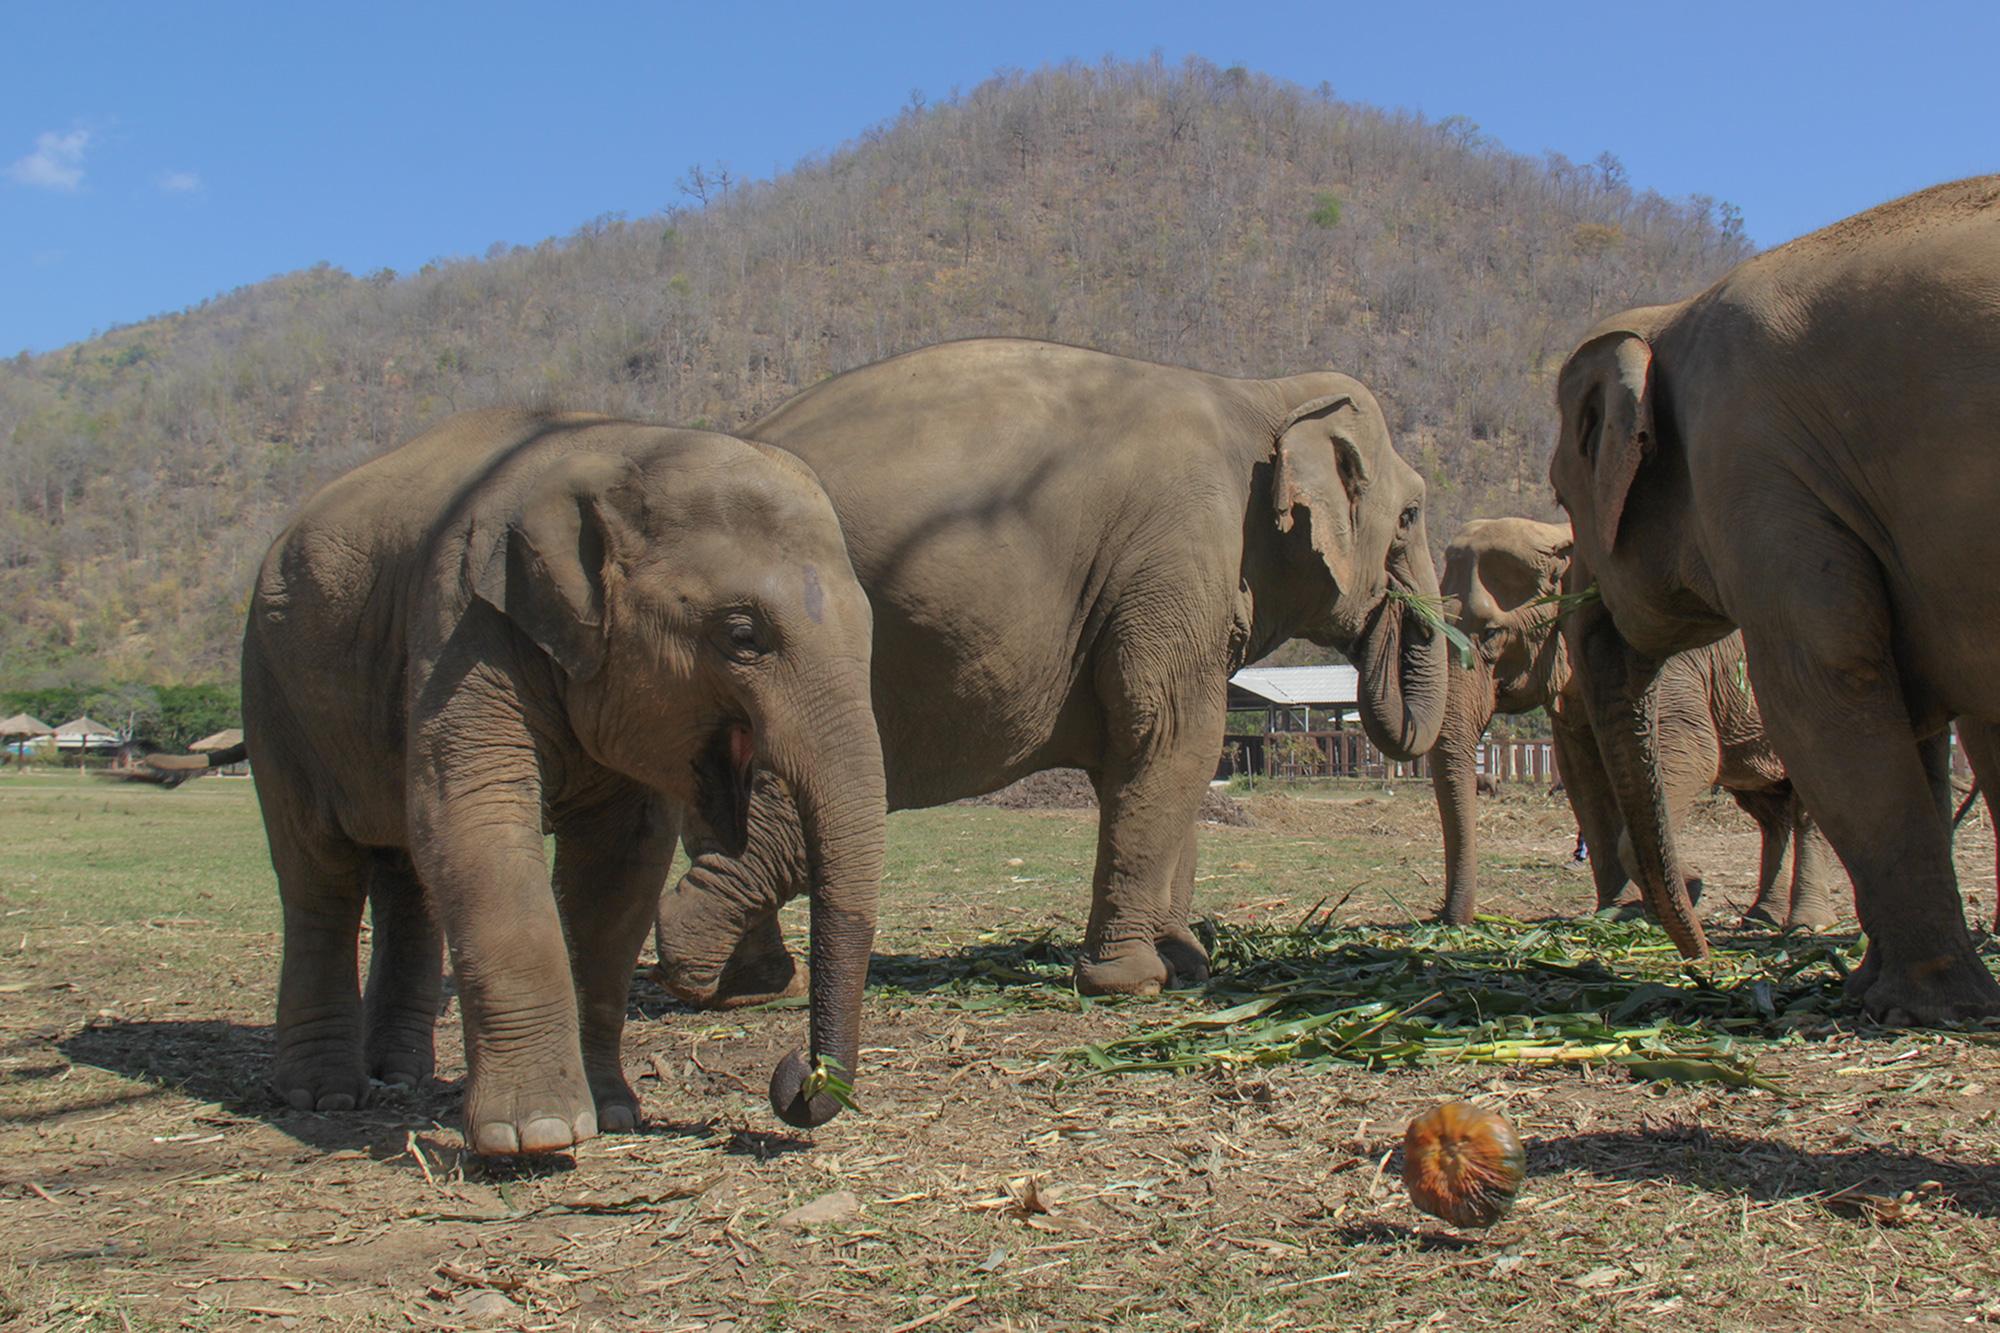 Elephant_Nature_Park_norsuvauva